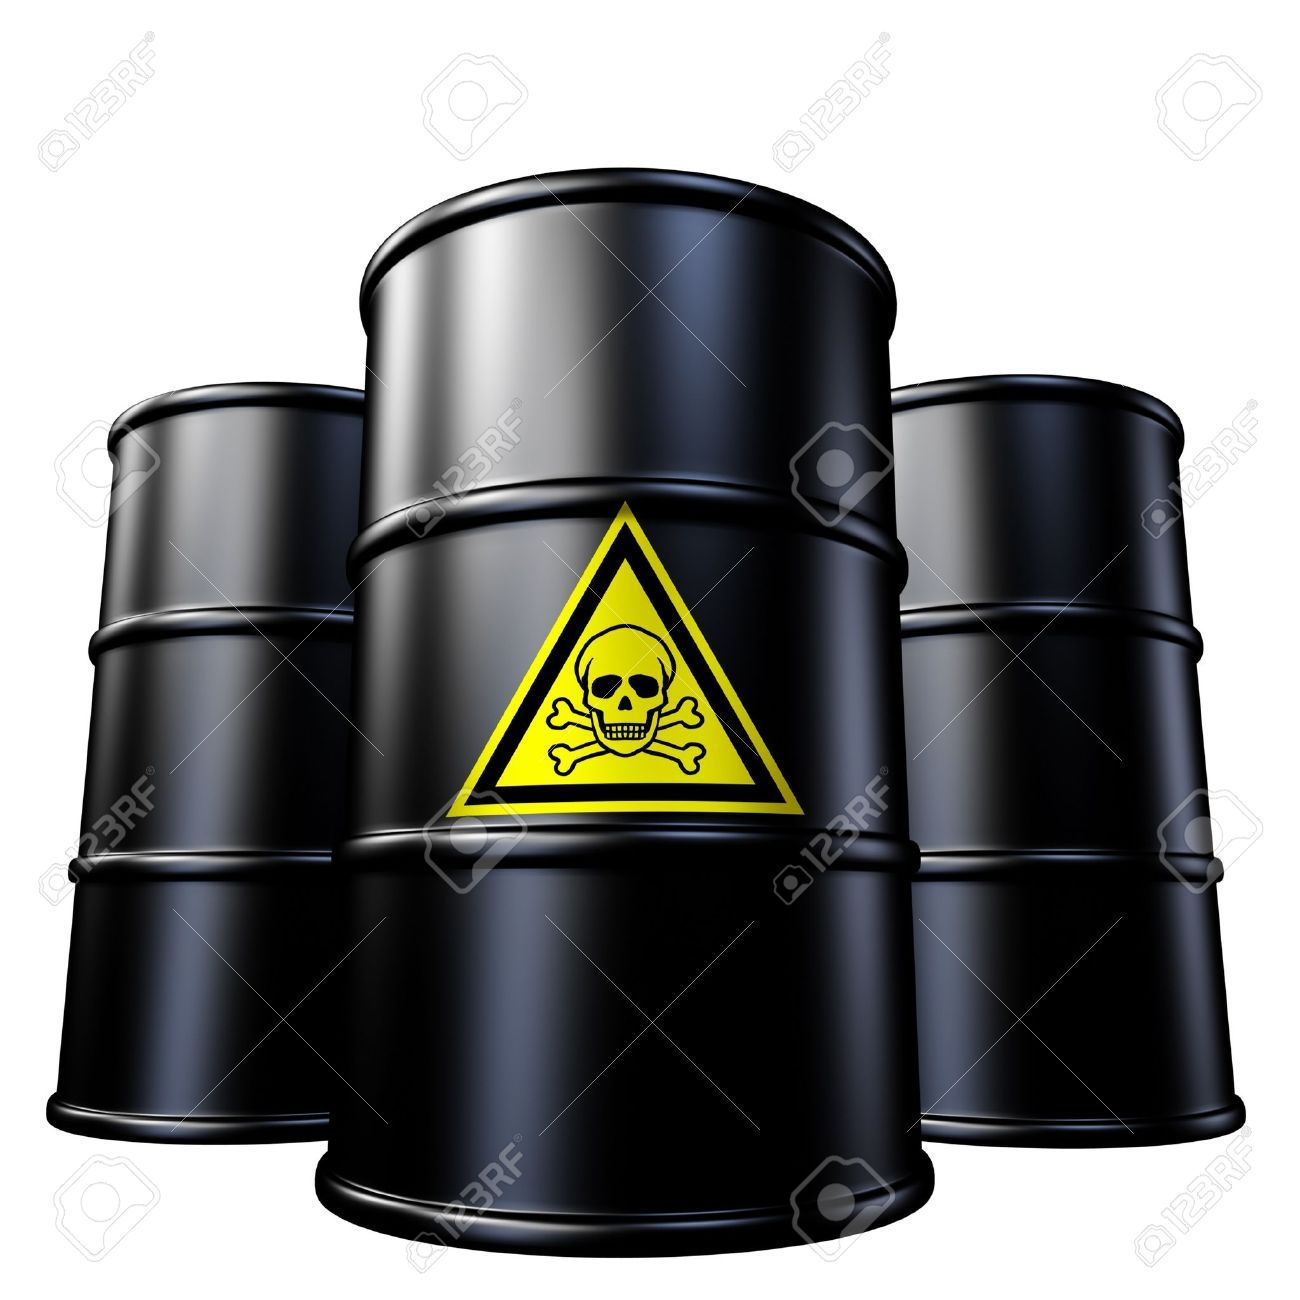 Oil barrel cartoon pesquisa google masa pinterest oil toxic waste barrels symbol represented by black metal oil and chemical drums buycottarizona